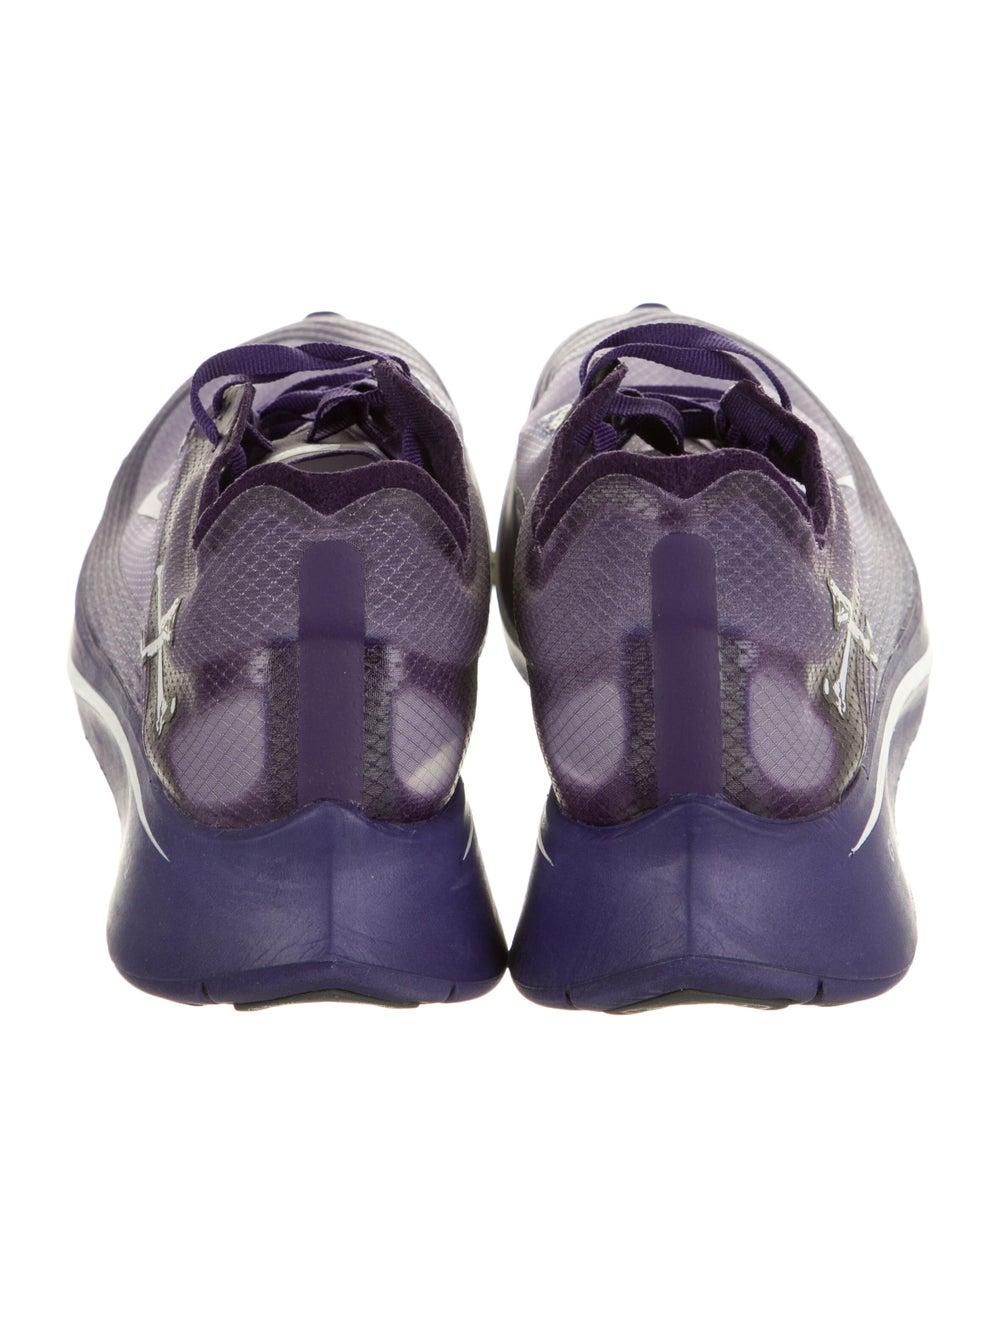 Nike Zoom Fly Undercover Gyakusou Ink Sneakers in… - image 4